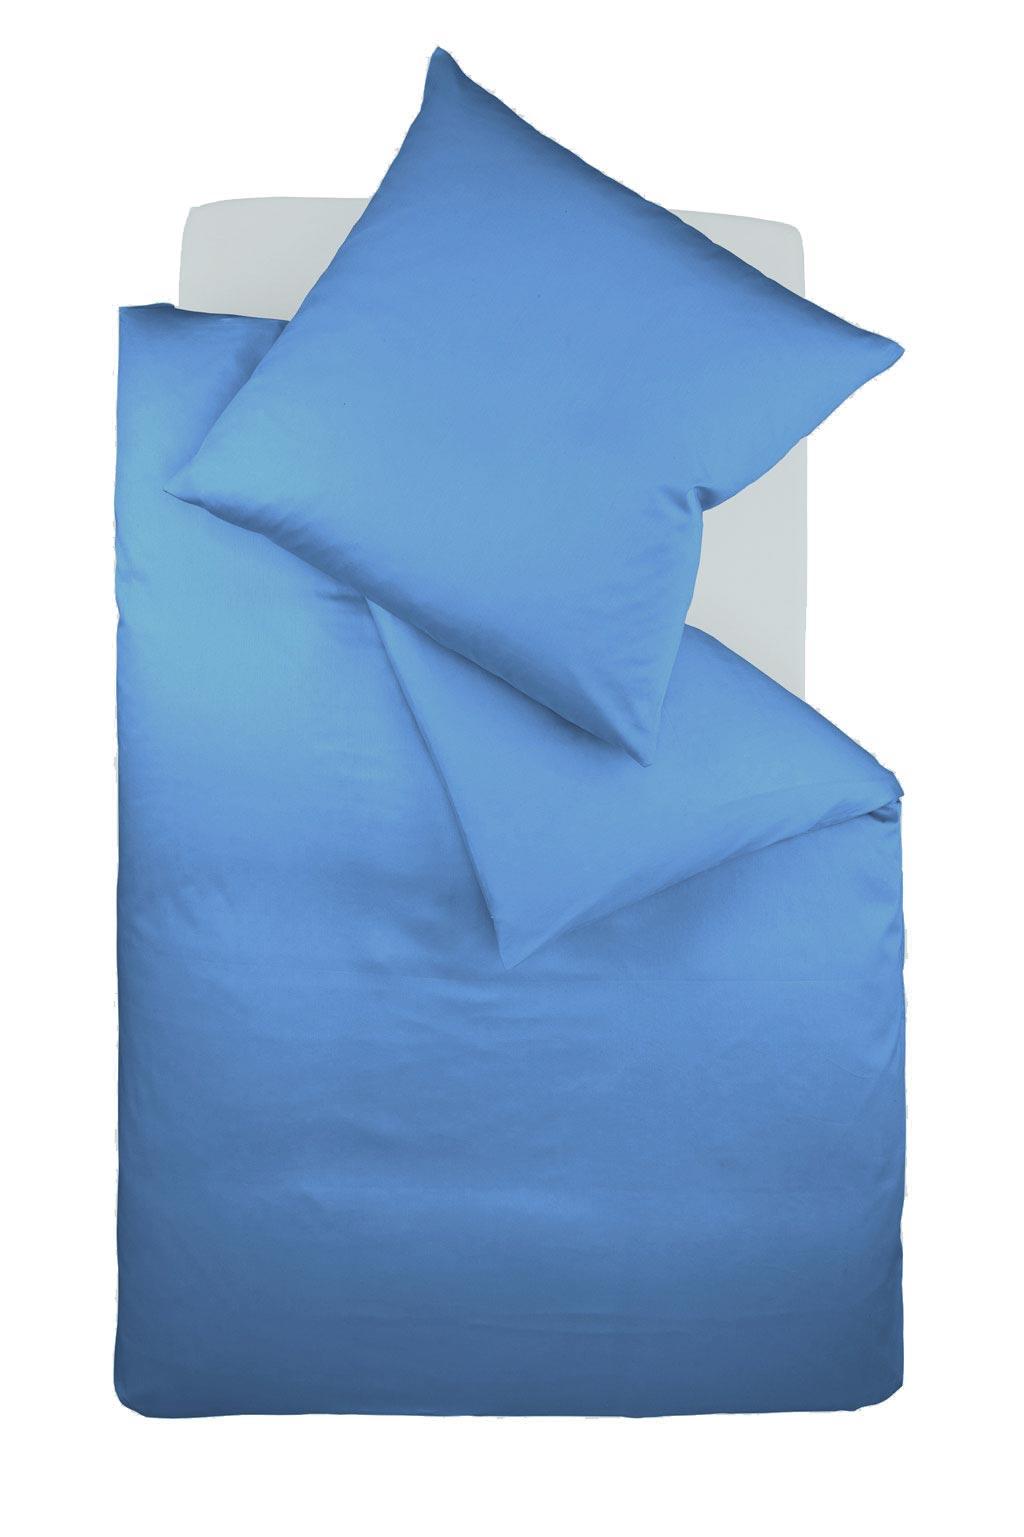 himmel blaue bettw sche mako satin baumwolle fleuresse colours ladyproject. Black Bedroom Furniture Sets. Home Design Ideas